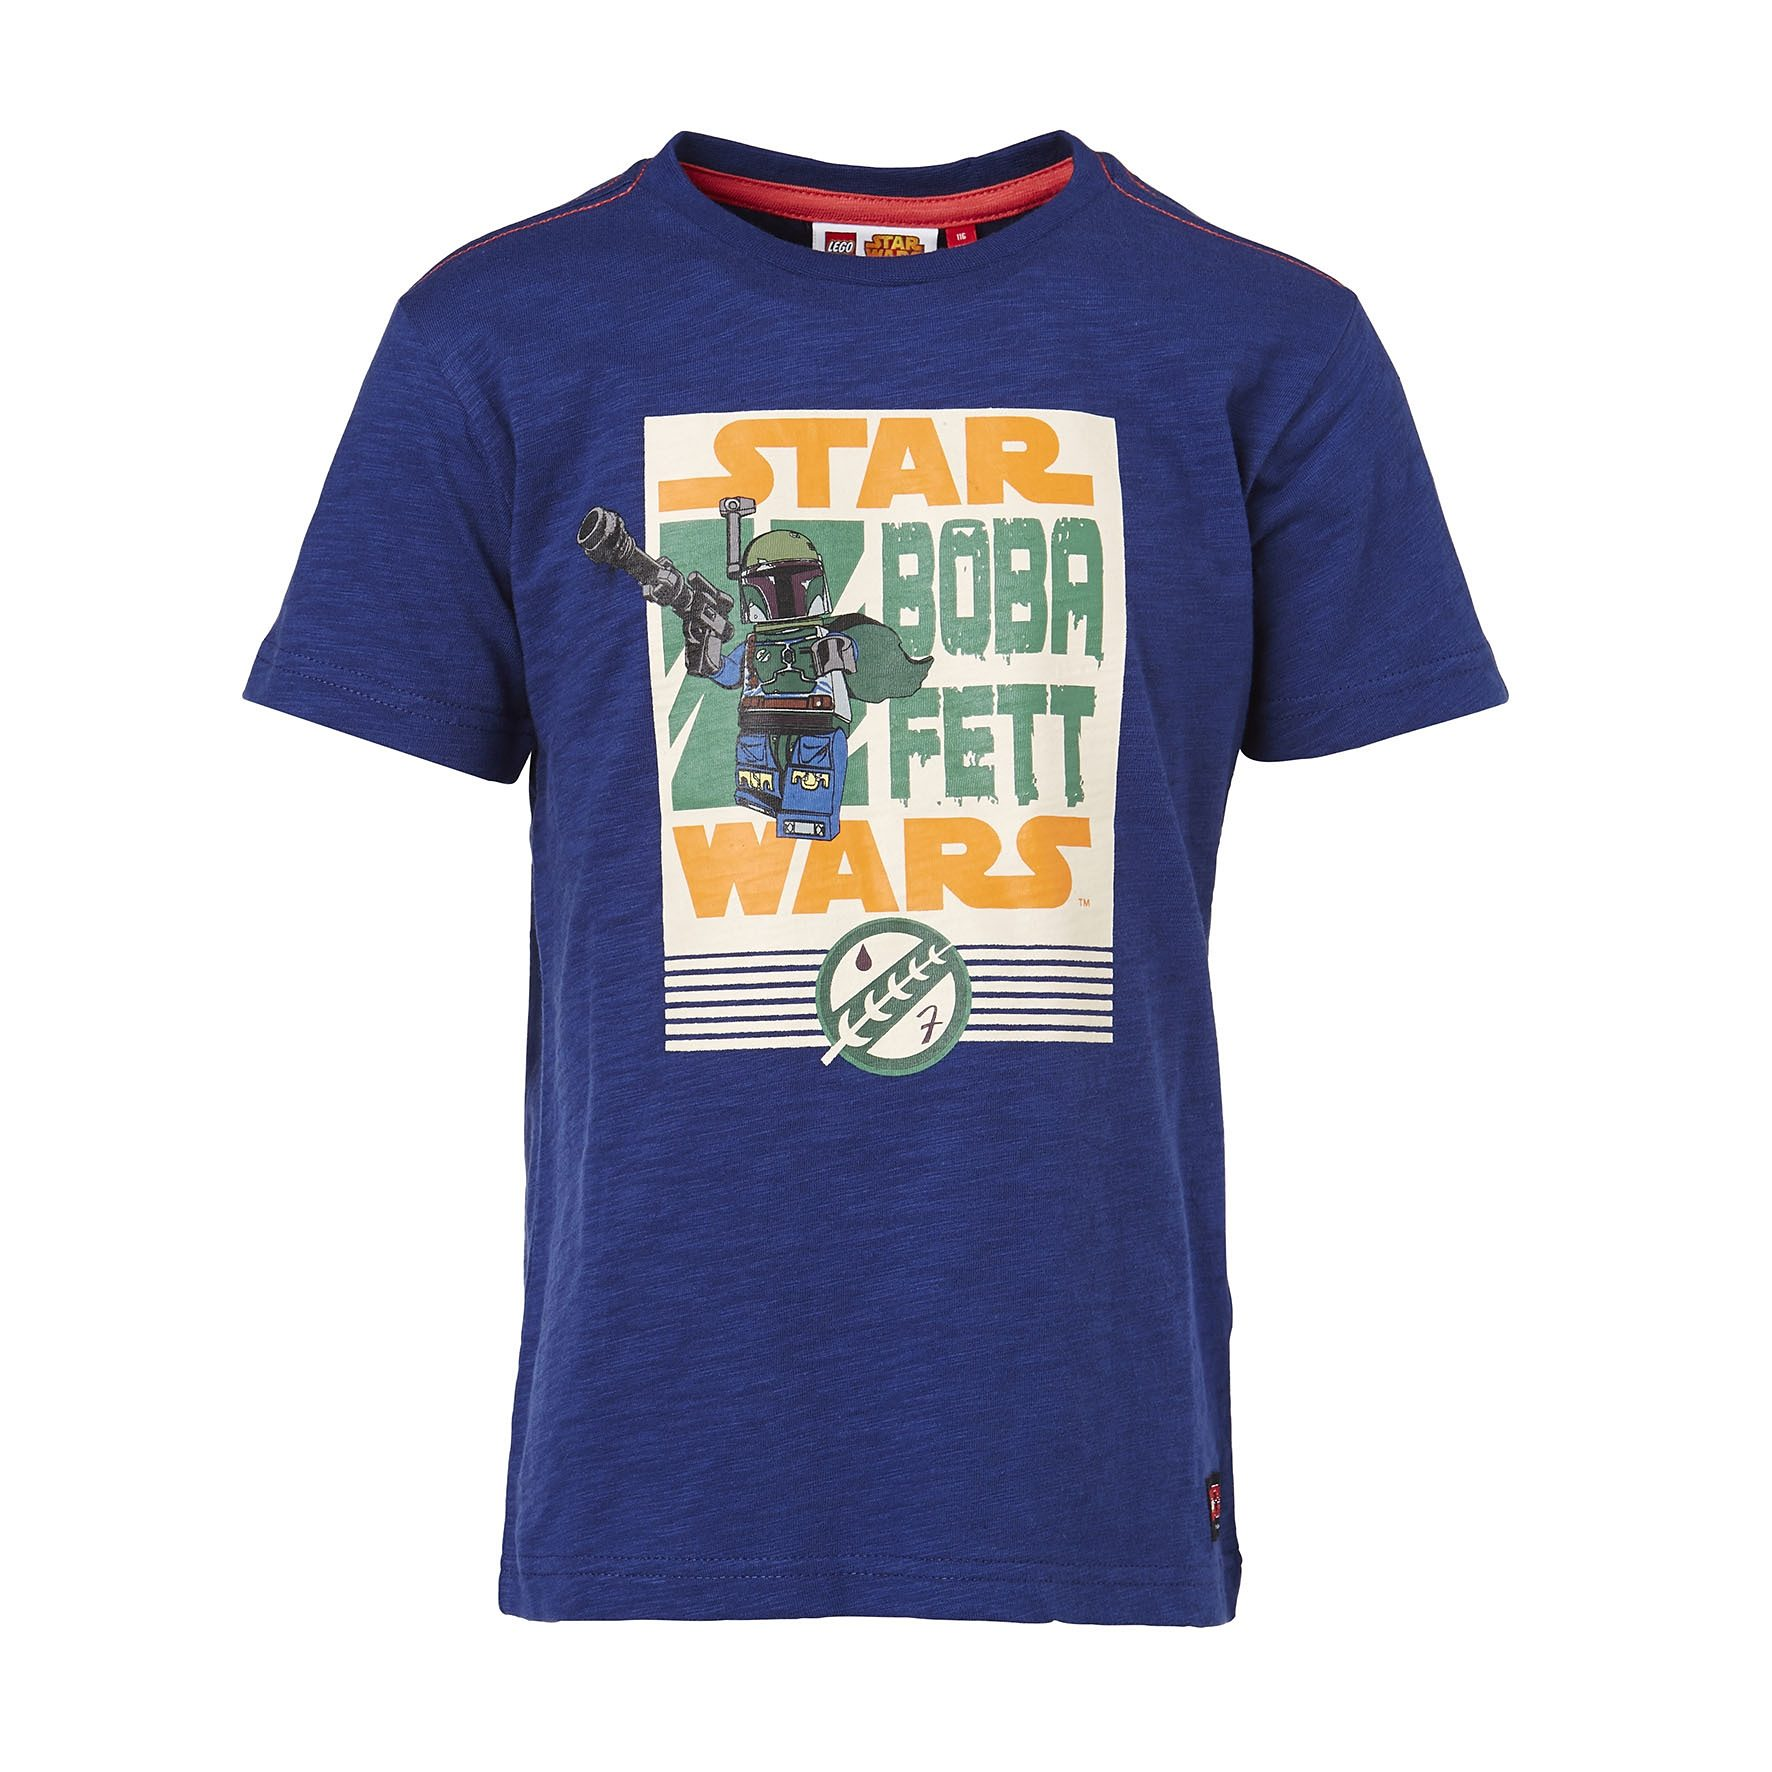 "LEGO Wear STAR WARS(TM) Kurzarm-T-Shirt Timmy ""Boba Fett"" Shirt"